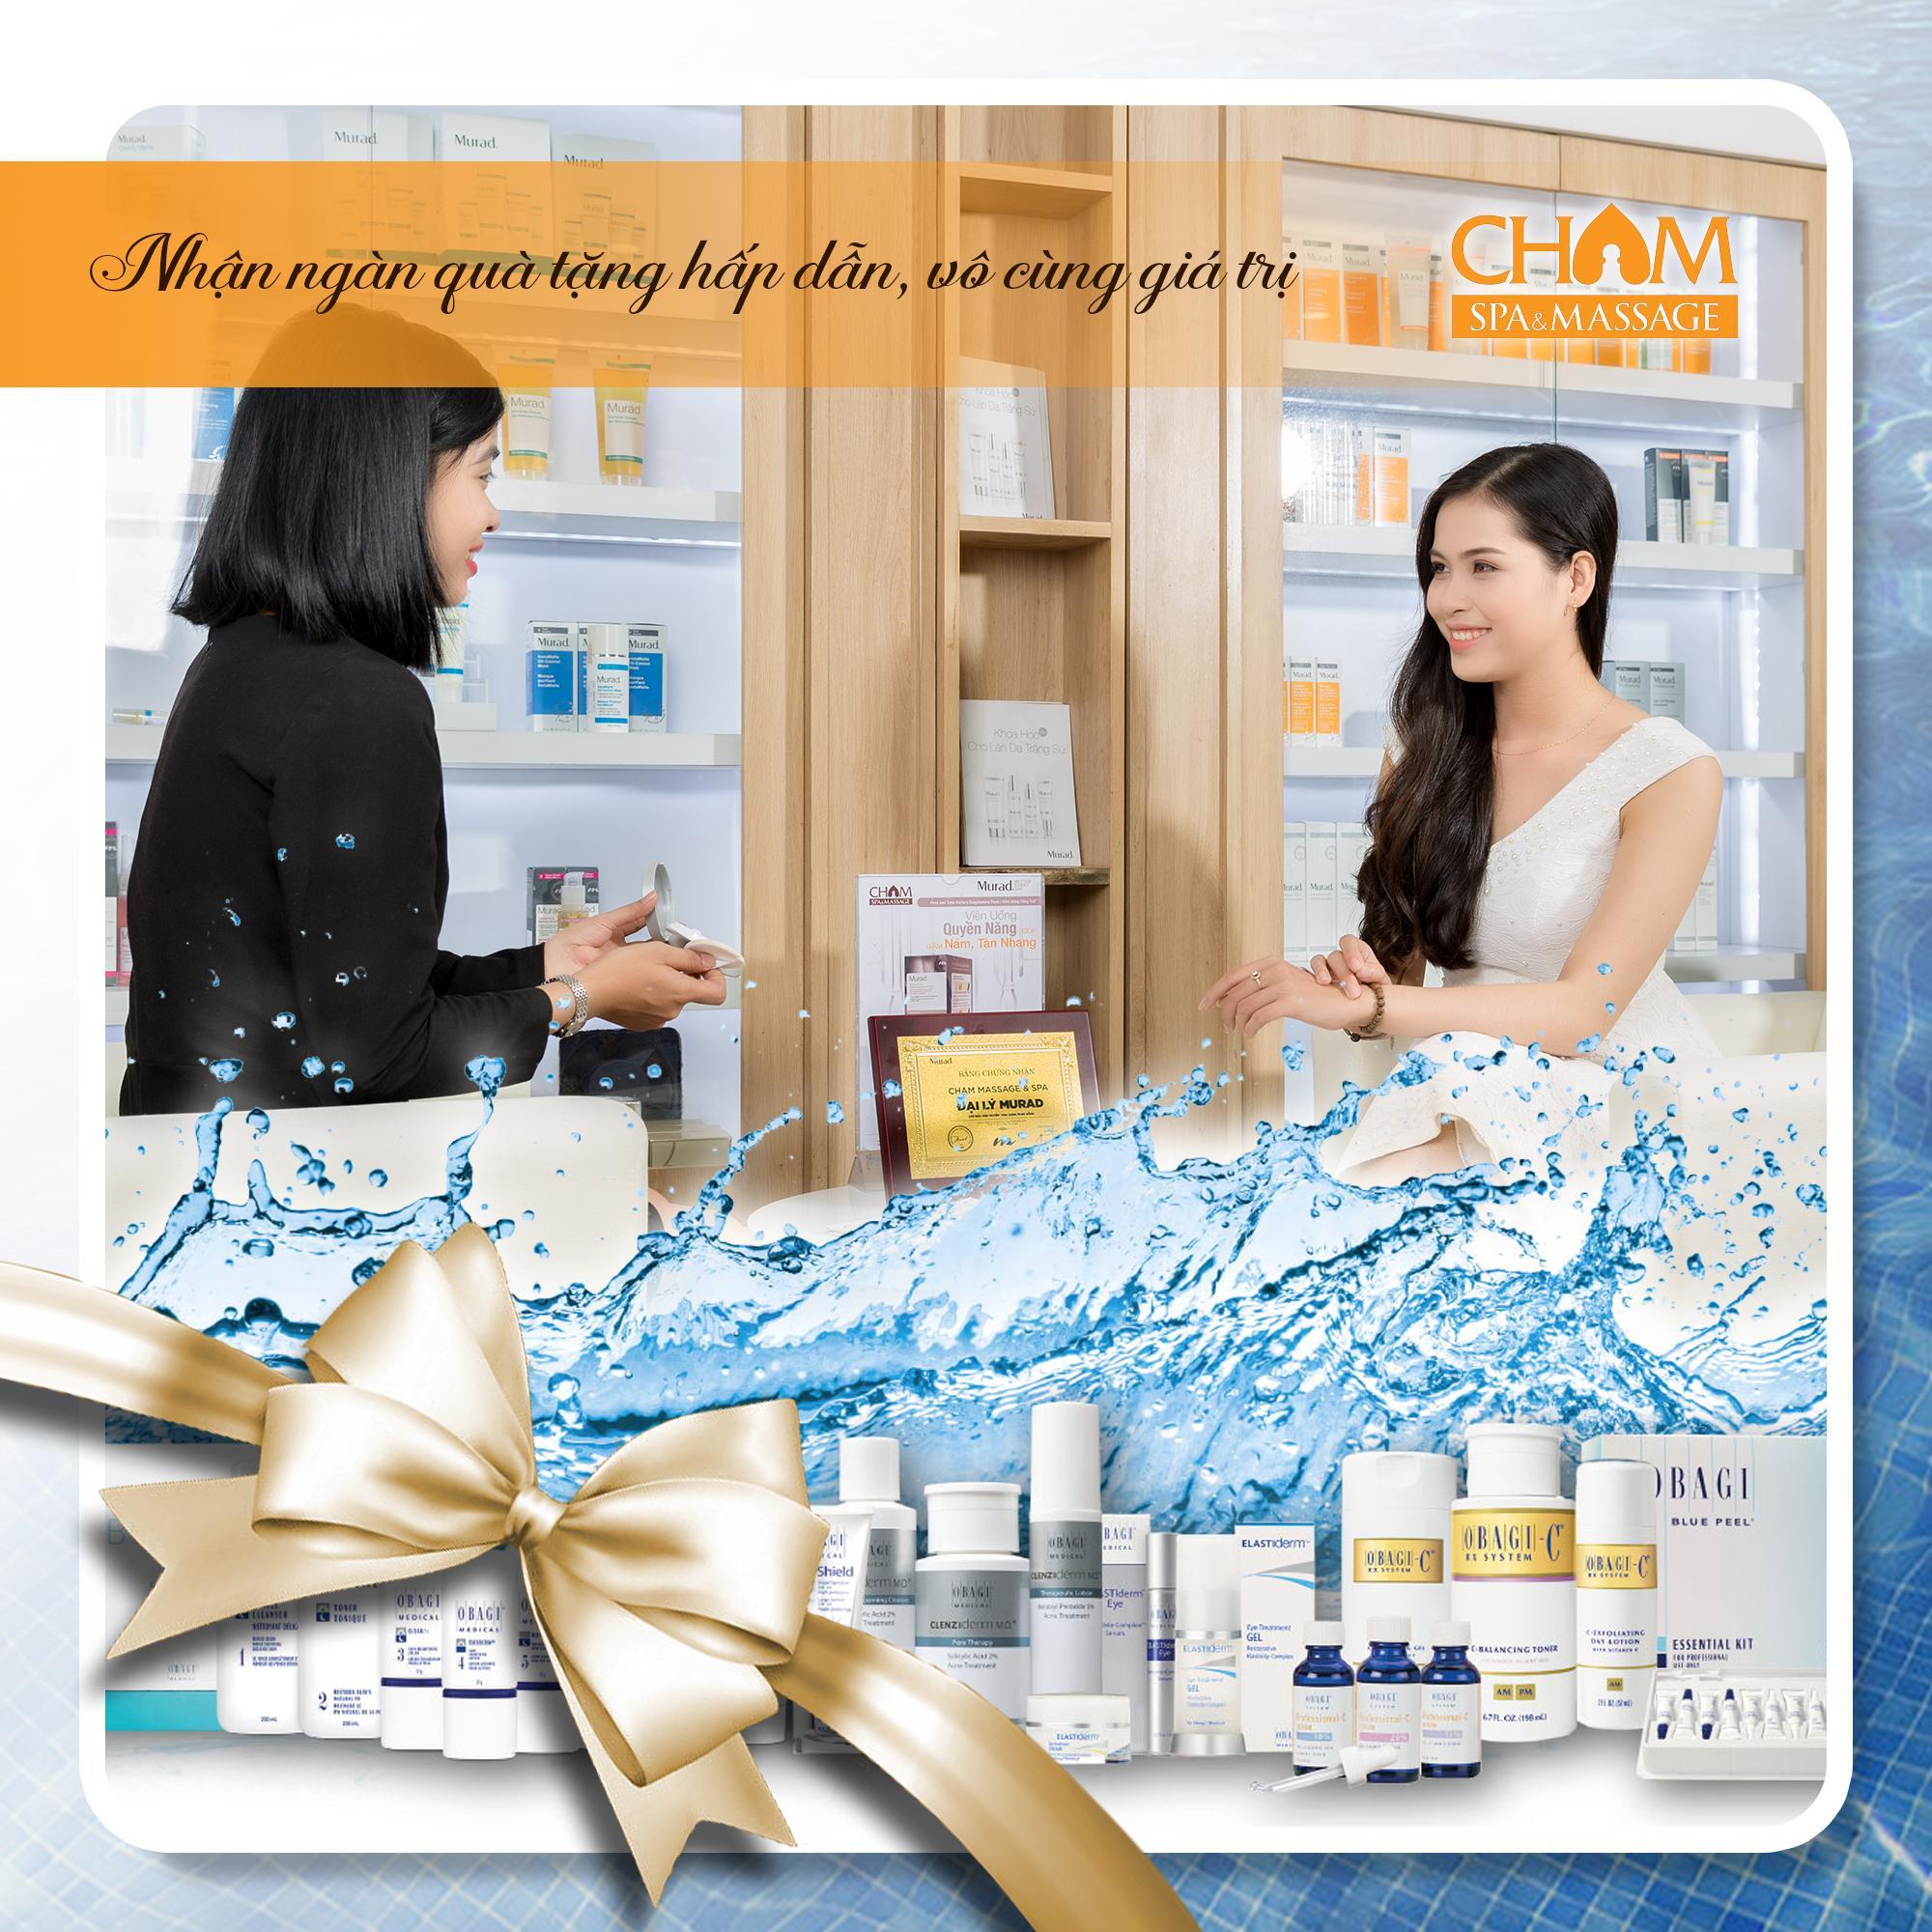 Khuyến mãi Voucher sức khỏe Cham Spa & Massage